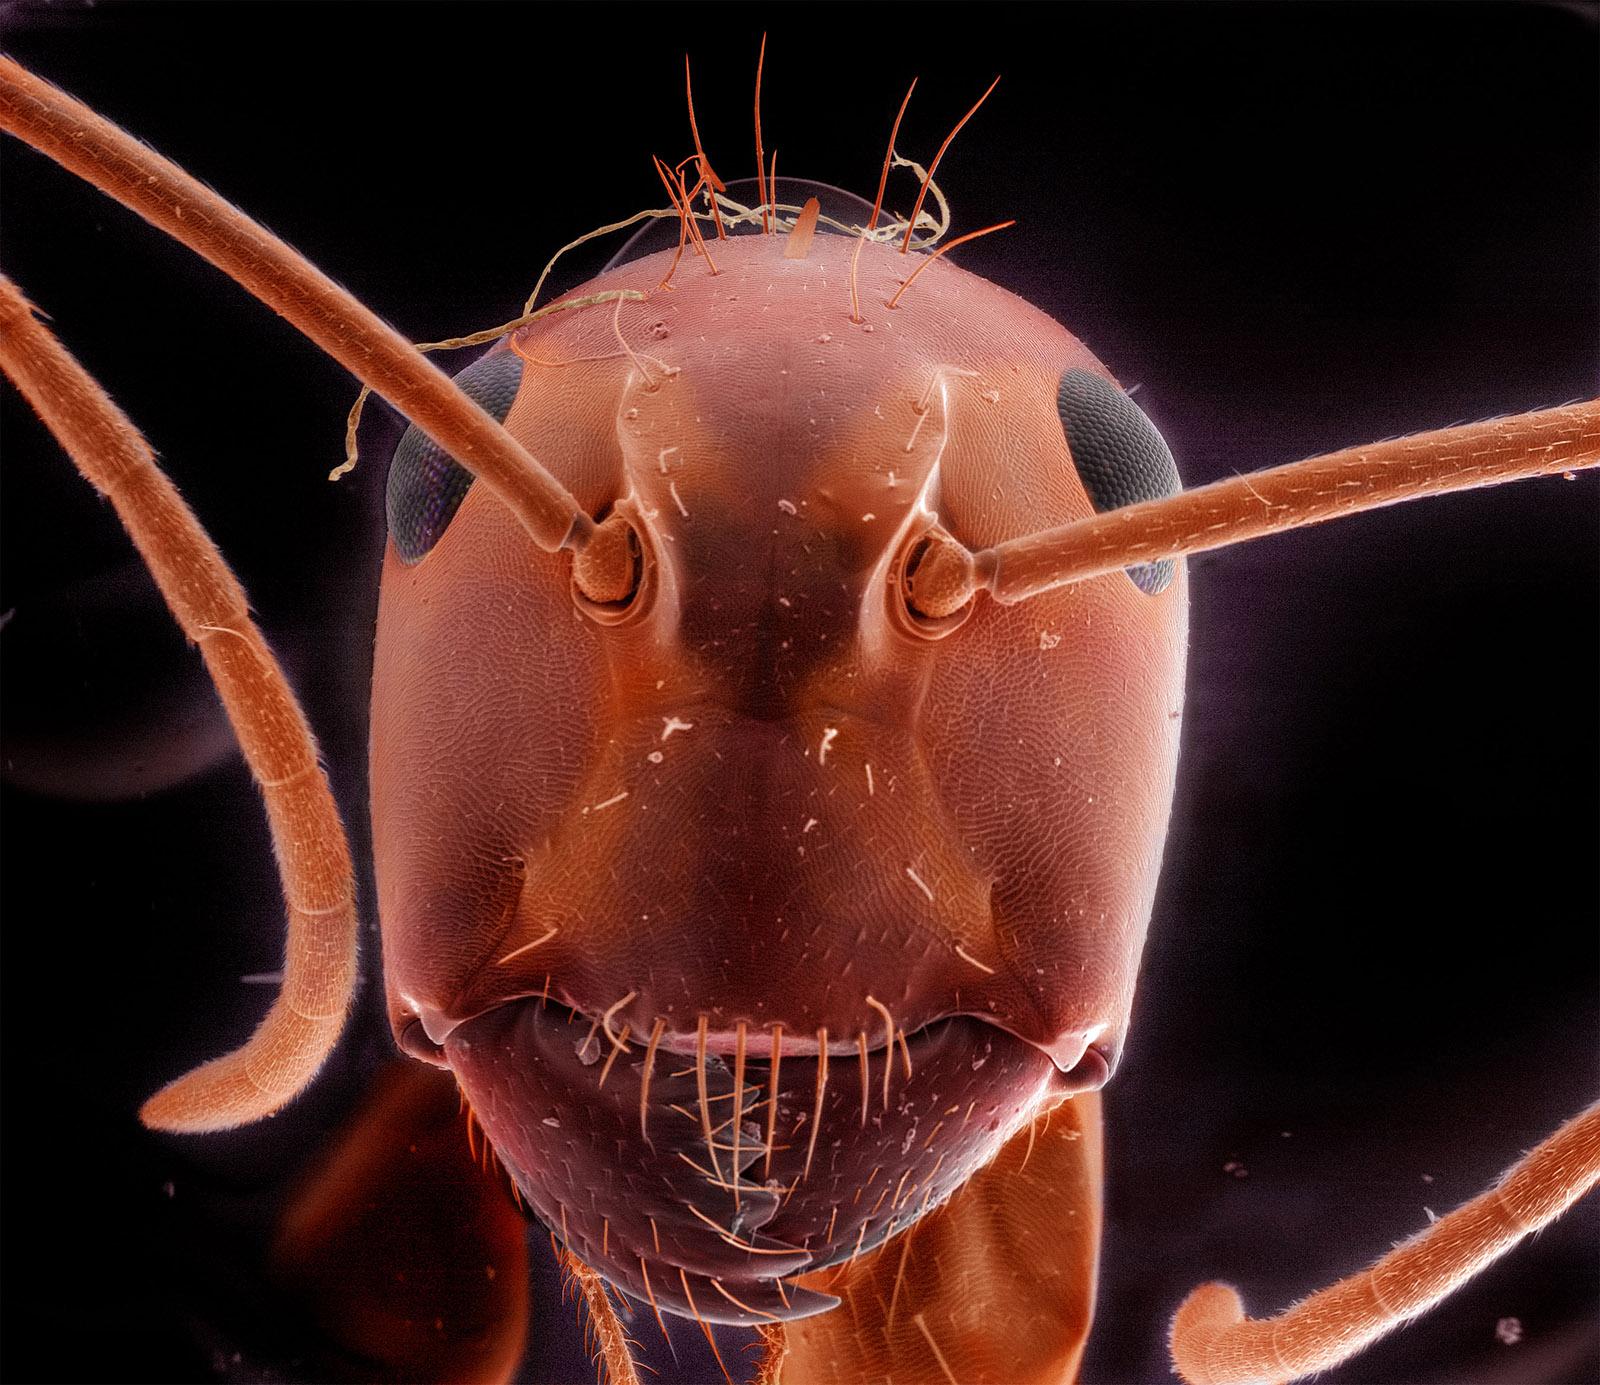 Back Yard Porch, September 12th [Red Carpenter Ant], 2011 © Daniel Kariko